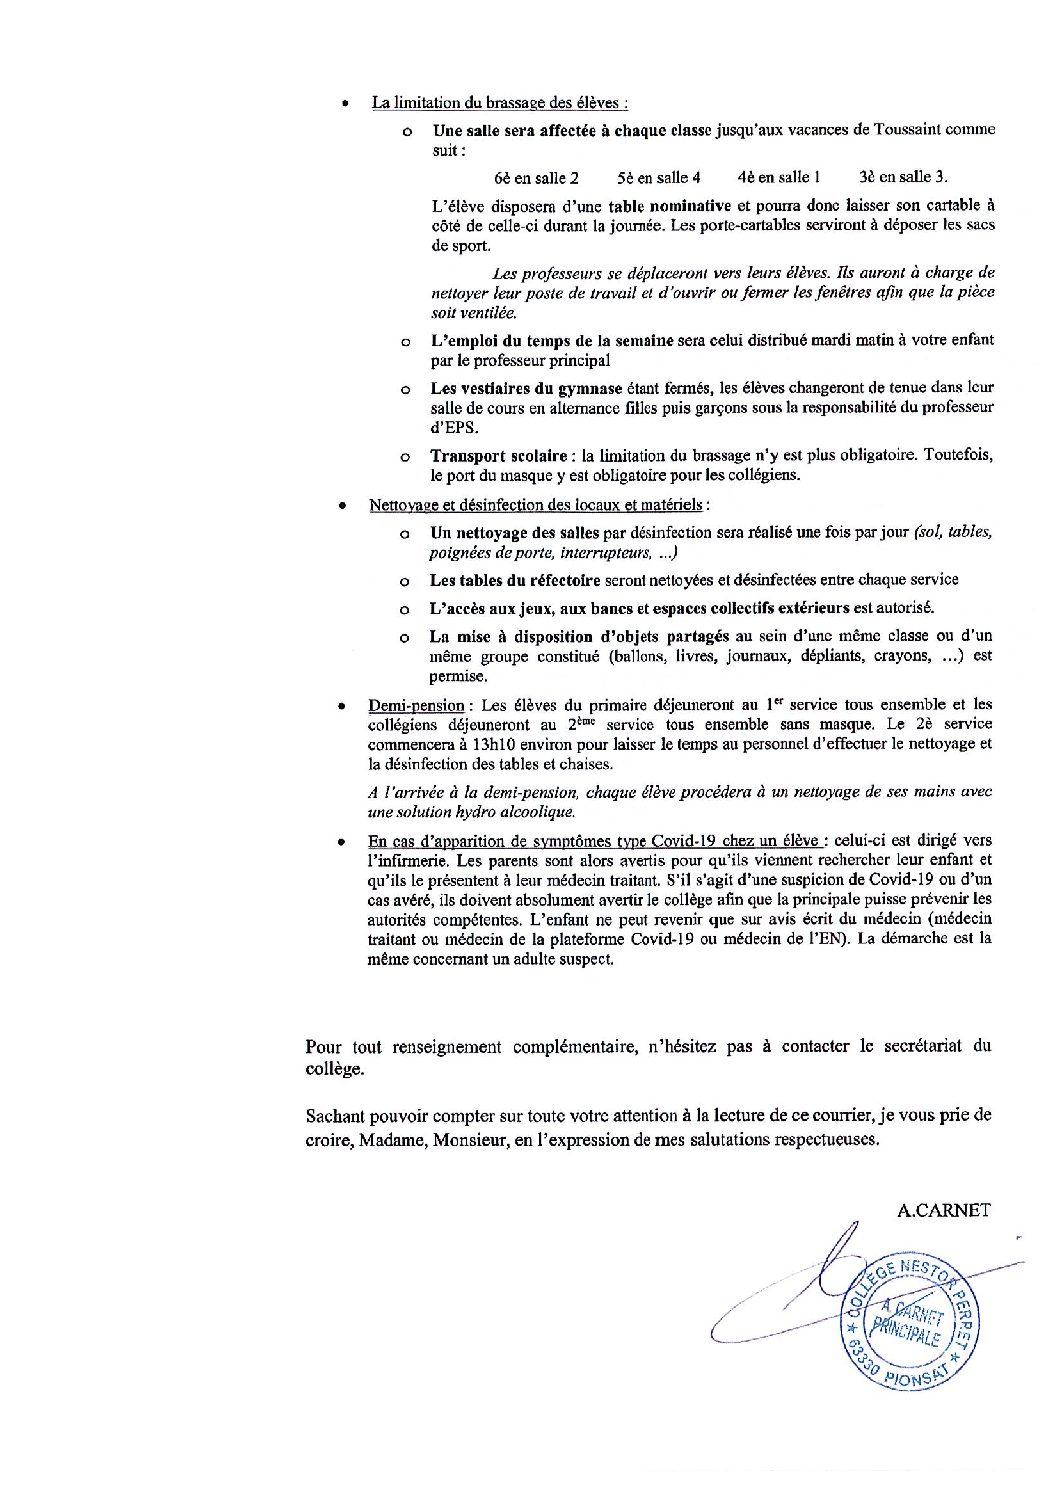 PROTOCOLE SANITAIRE RENTREE 2020 AU COLLEGE